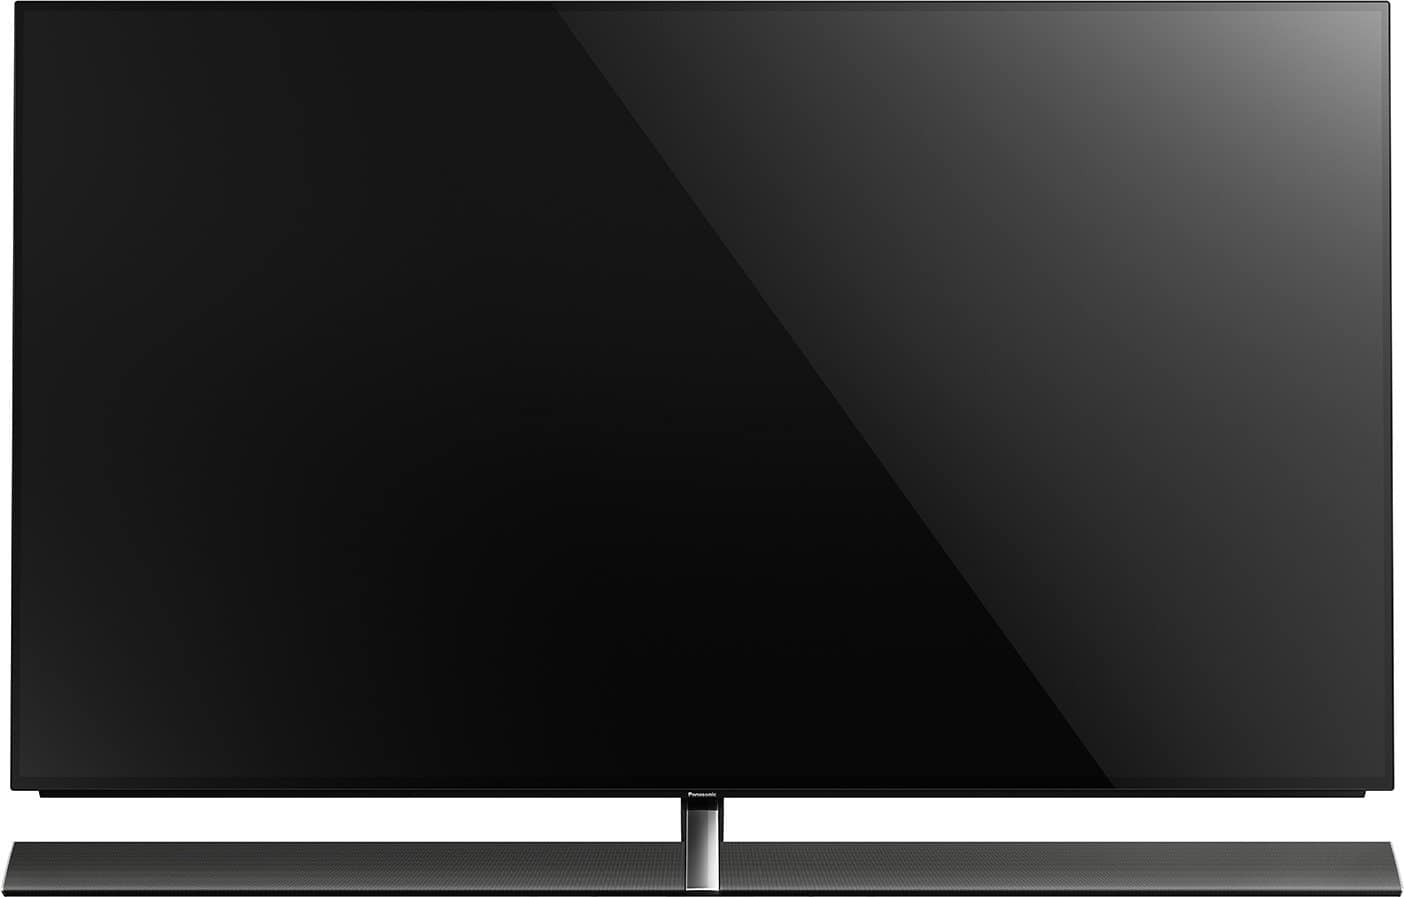 panasonic tx 77ezw1004 dein. Black Bedroom Furniture Sets. Home Design Ideas